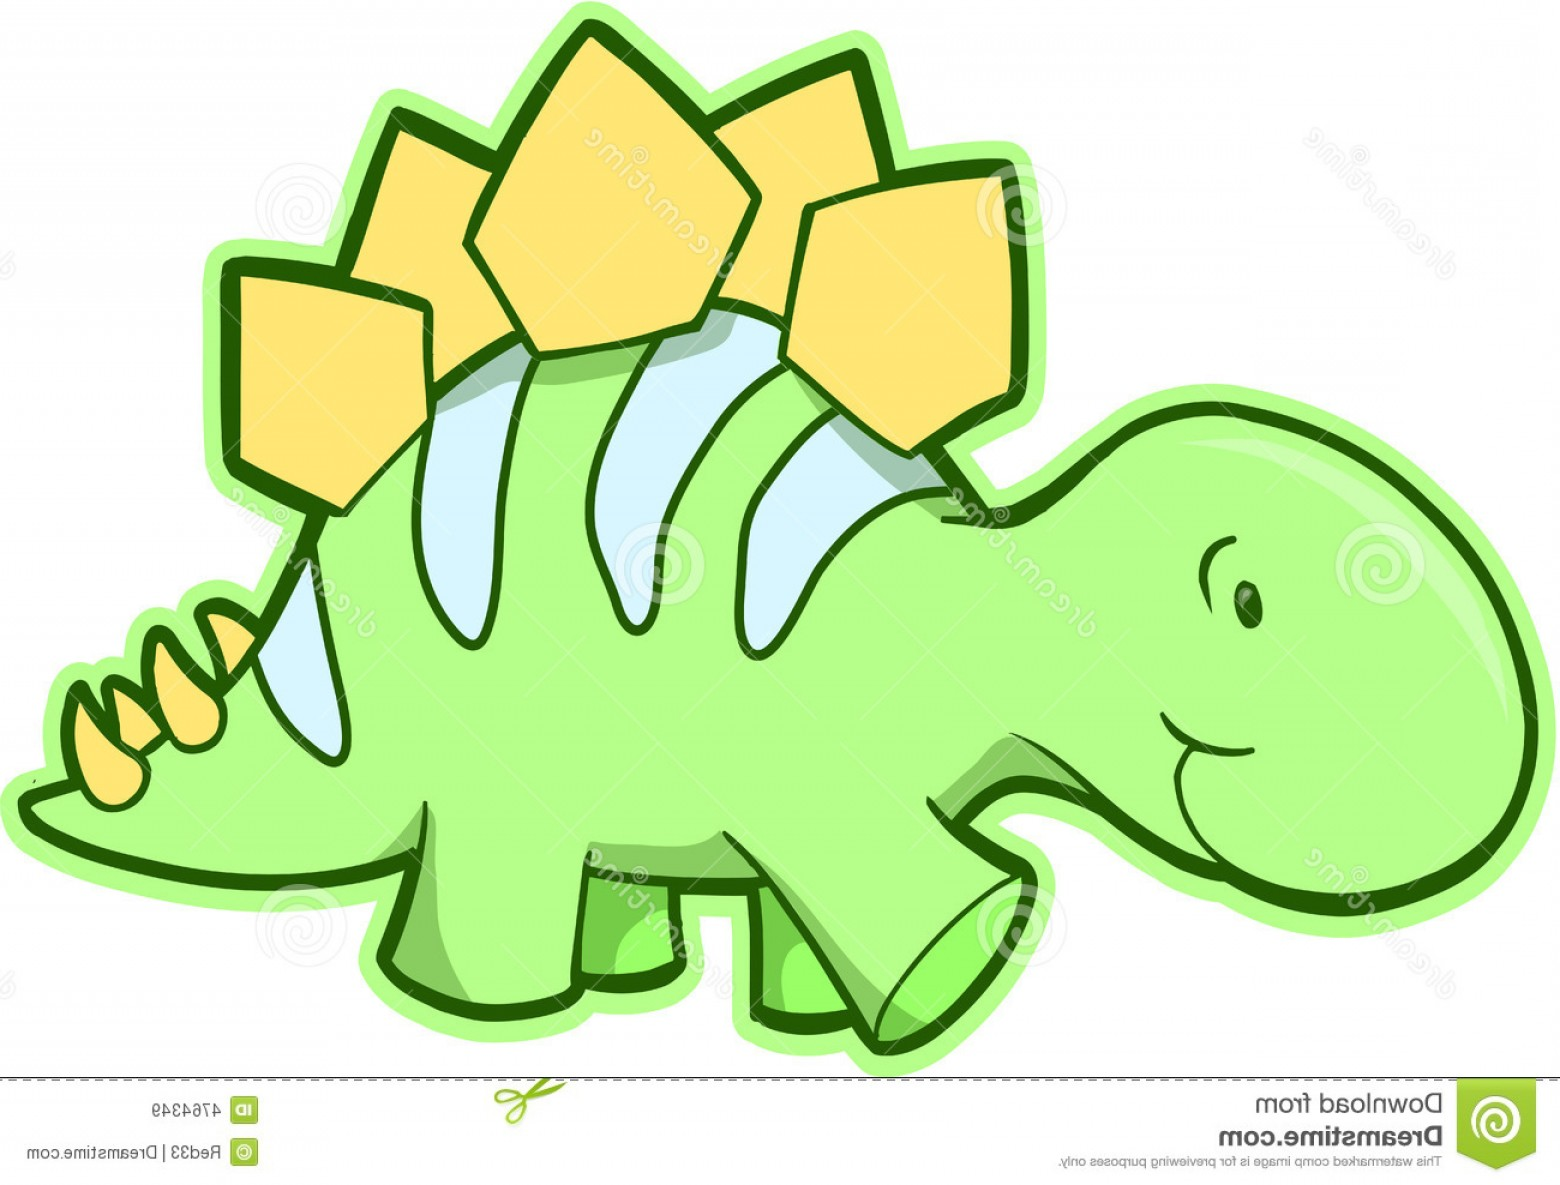 1560x1185 Royalty Free Stock Images Stegosaurus Dinosaur Vector Image